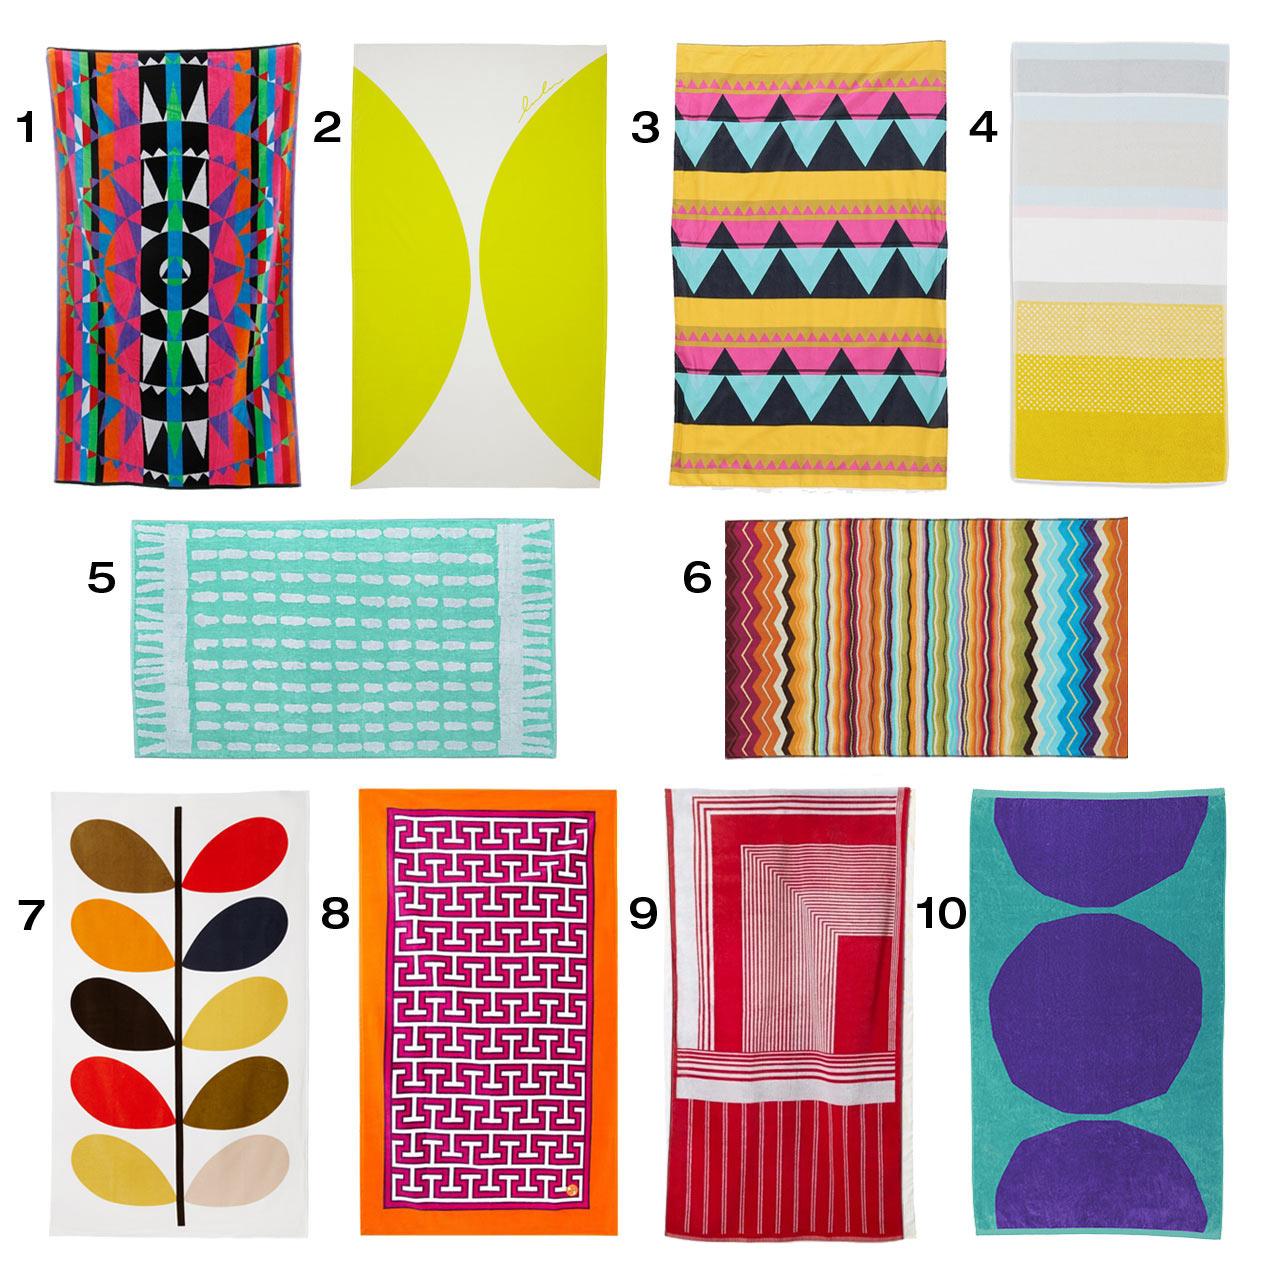 10 Colorful, Modern Beach Towels